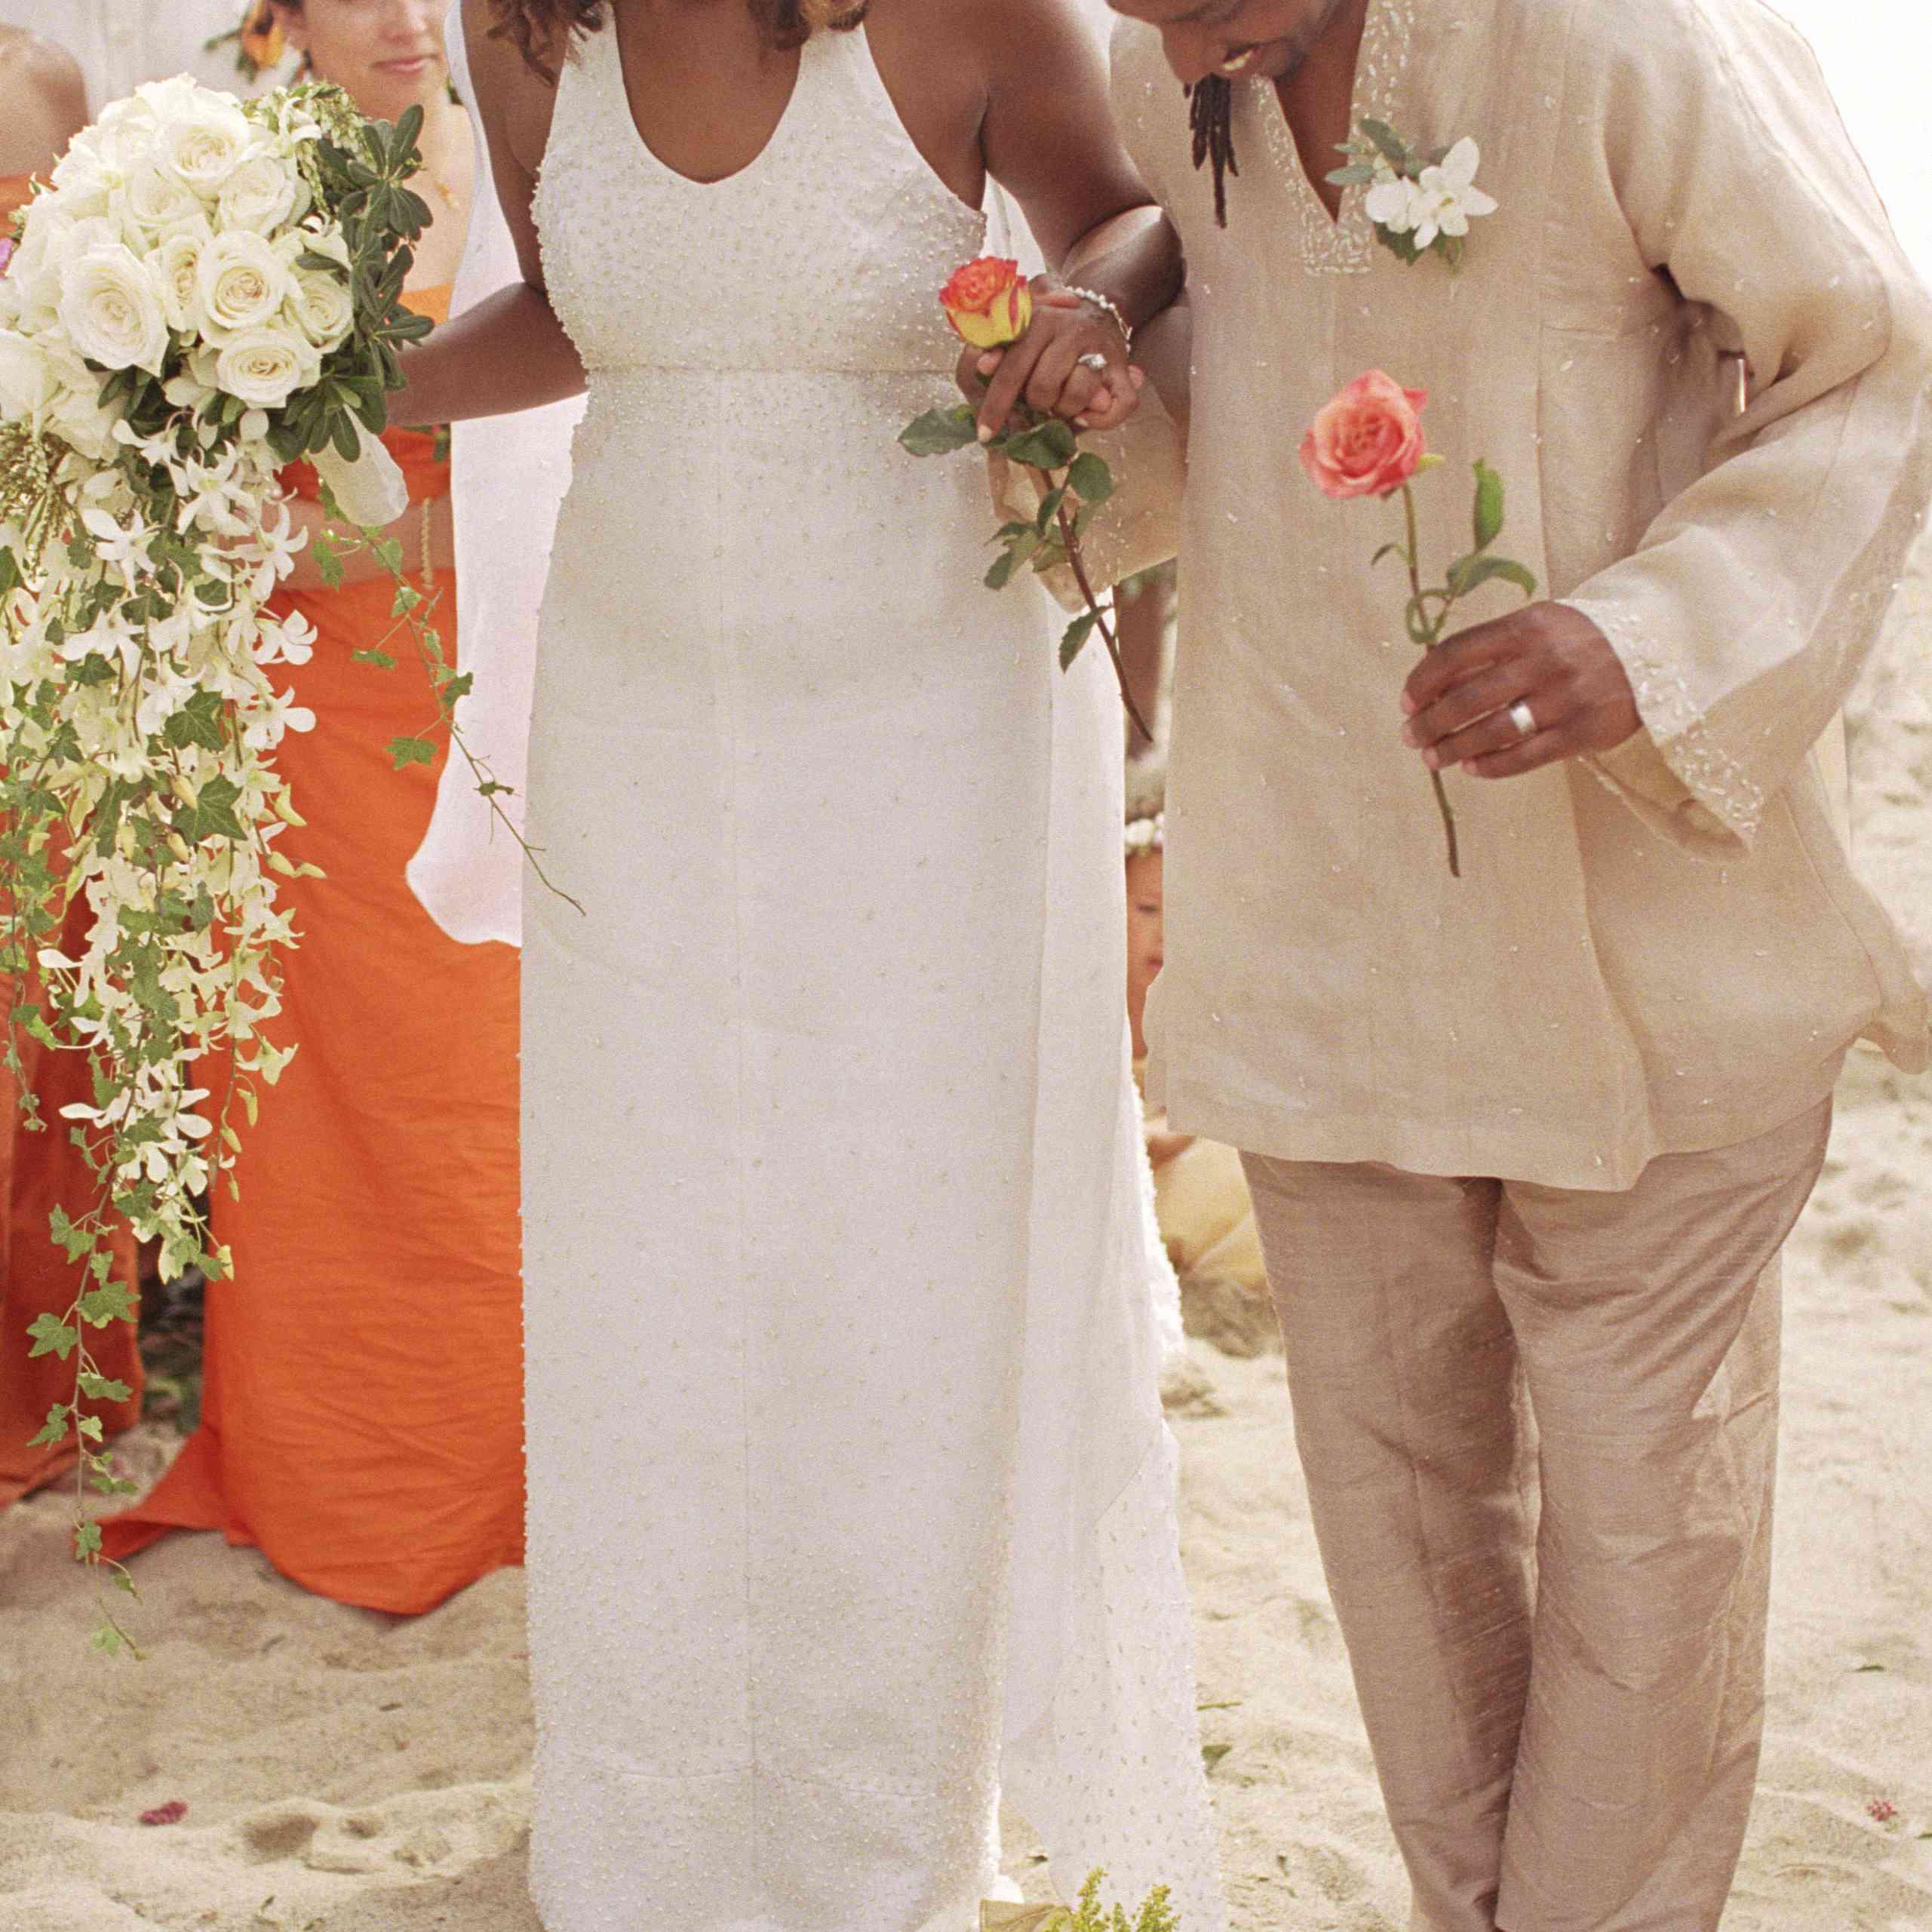 Wedding Ceremony Checklist and Event Planning